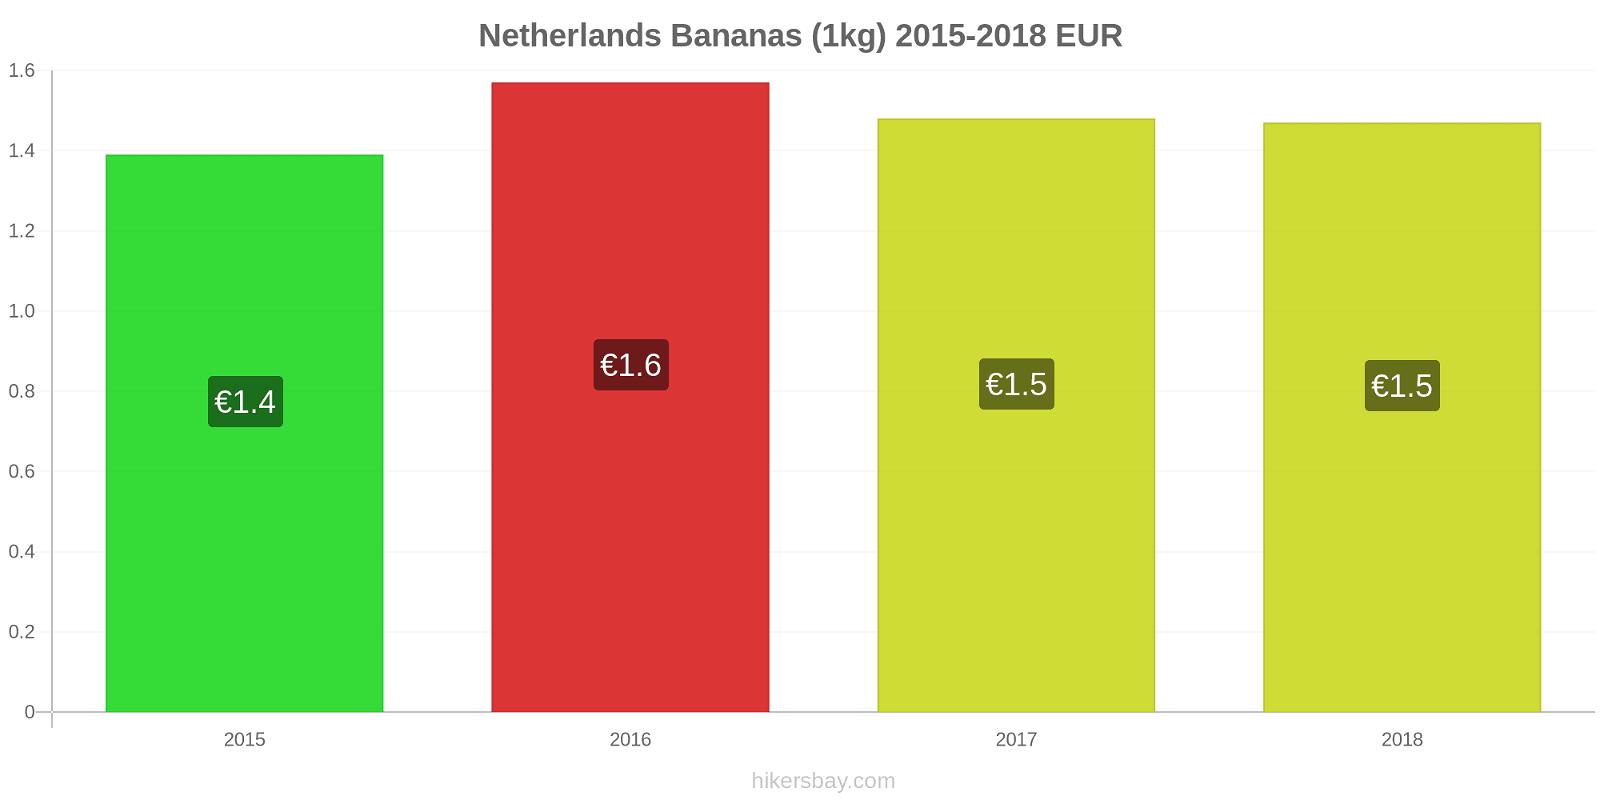 Netherlands price changes Bananas (1kg) hikersbay.com